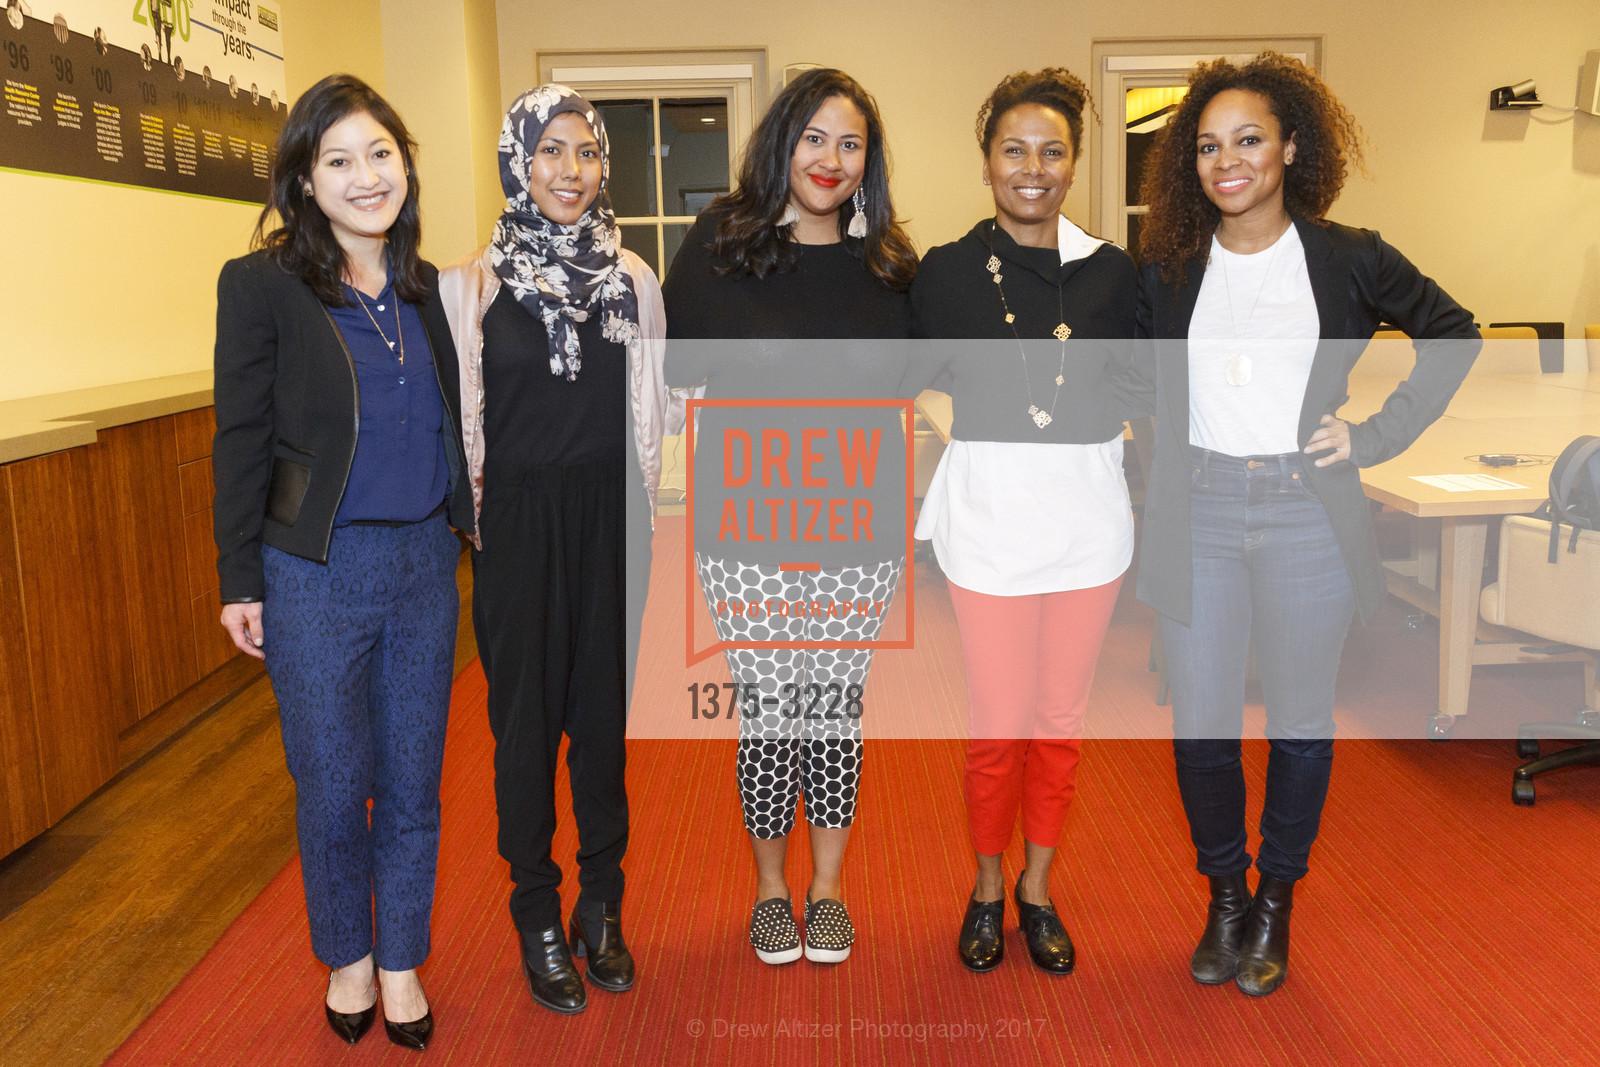 Mana Nakagawa, Johana Bhuiyan, Bettie Thompson, Maxine Williams, Monique Dorsainvil, Photo #1375-3228